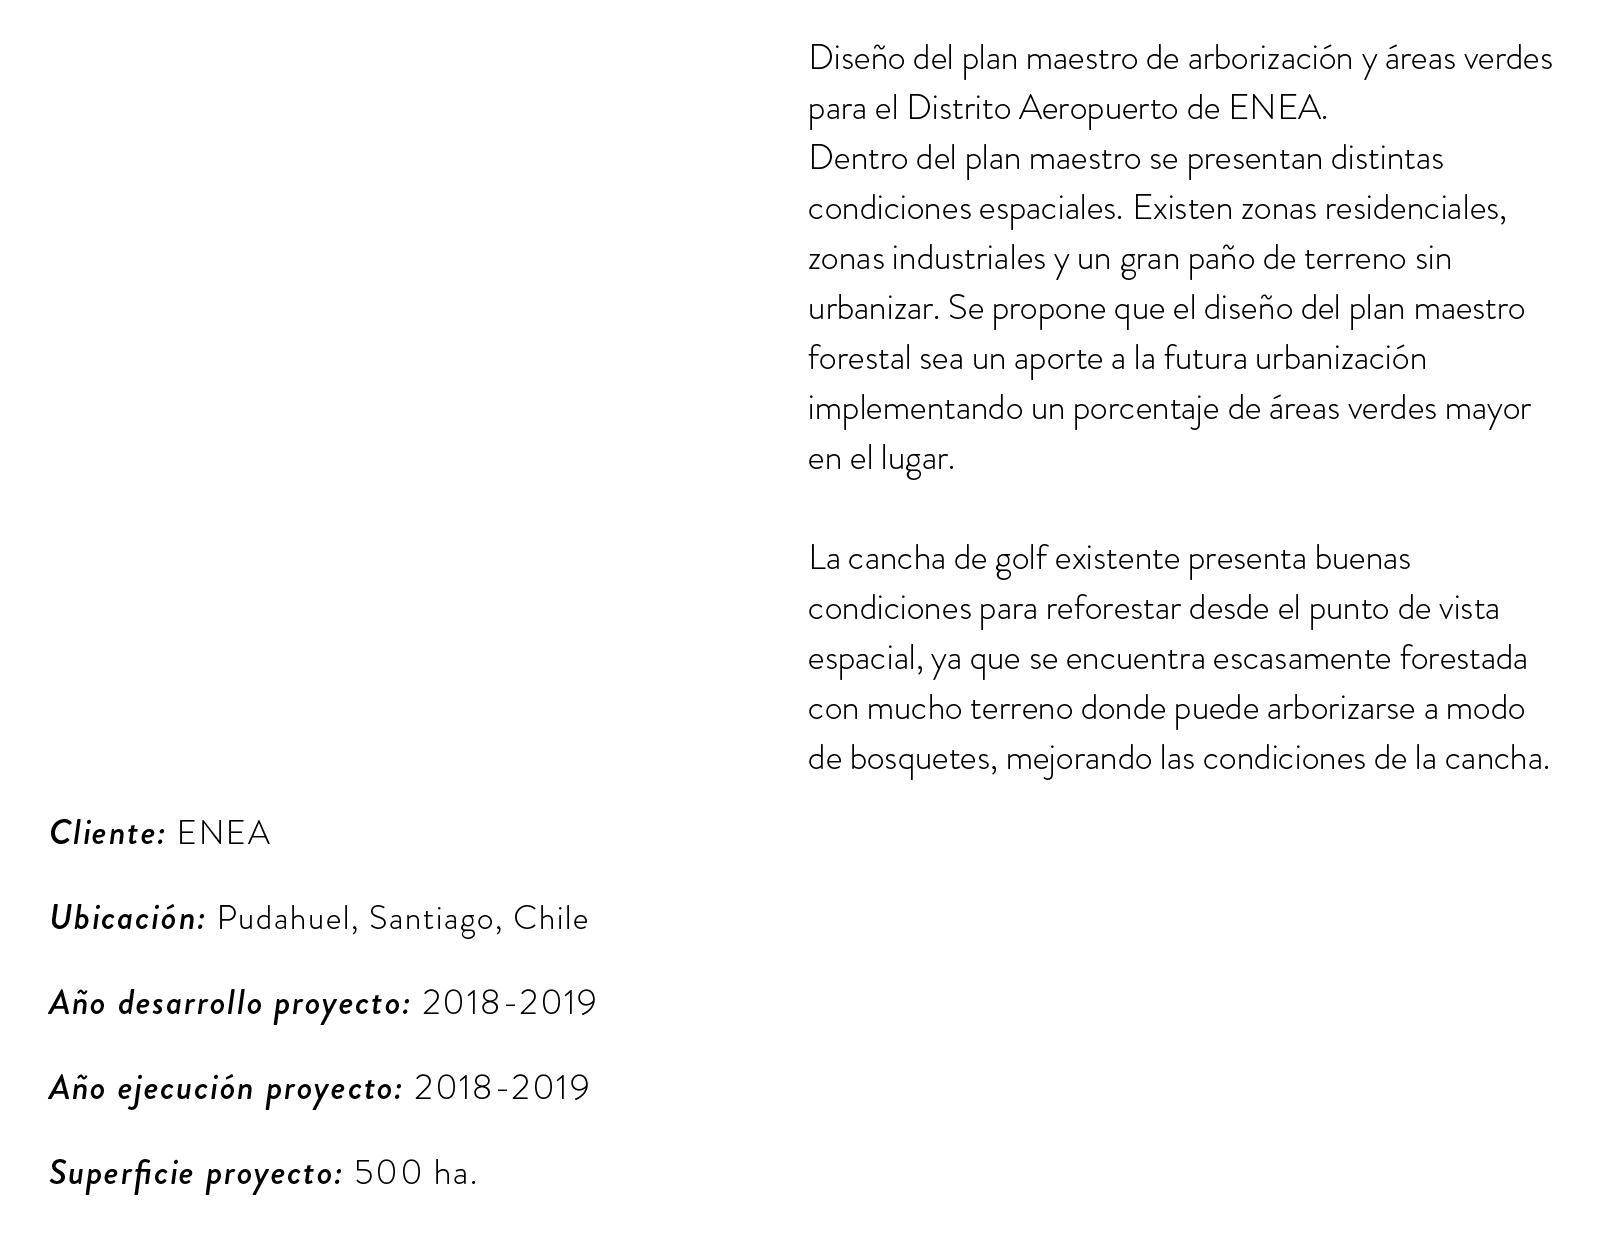 Formato Panoramico ENEA DISTRITO AEROPUERTO-02.jpg